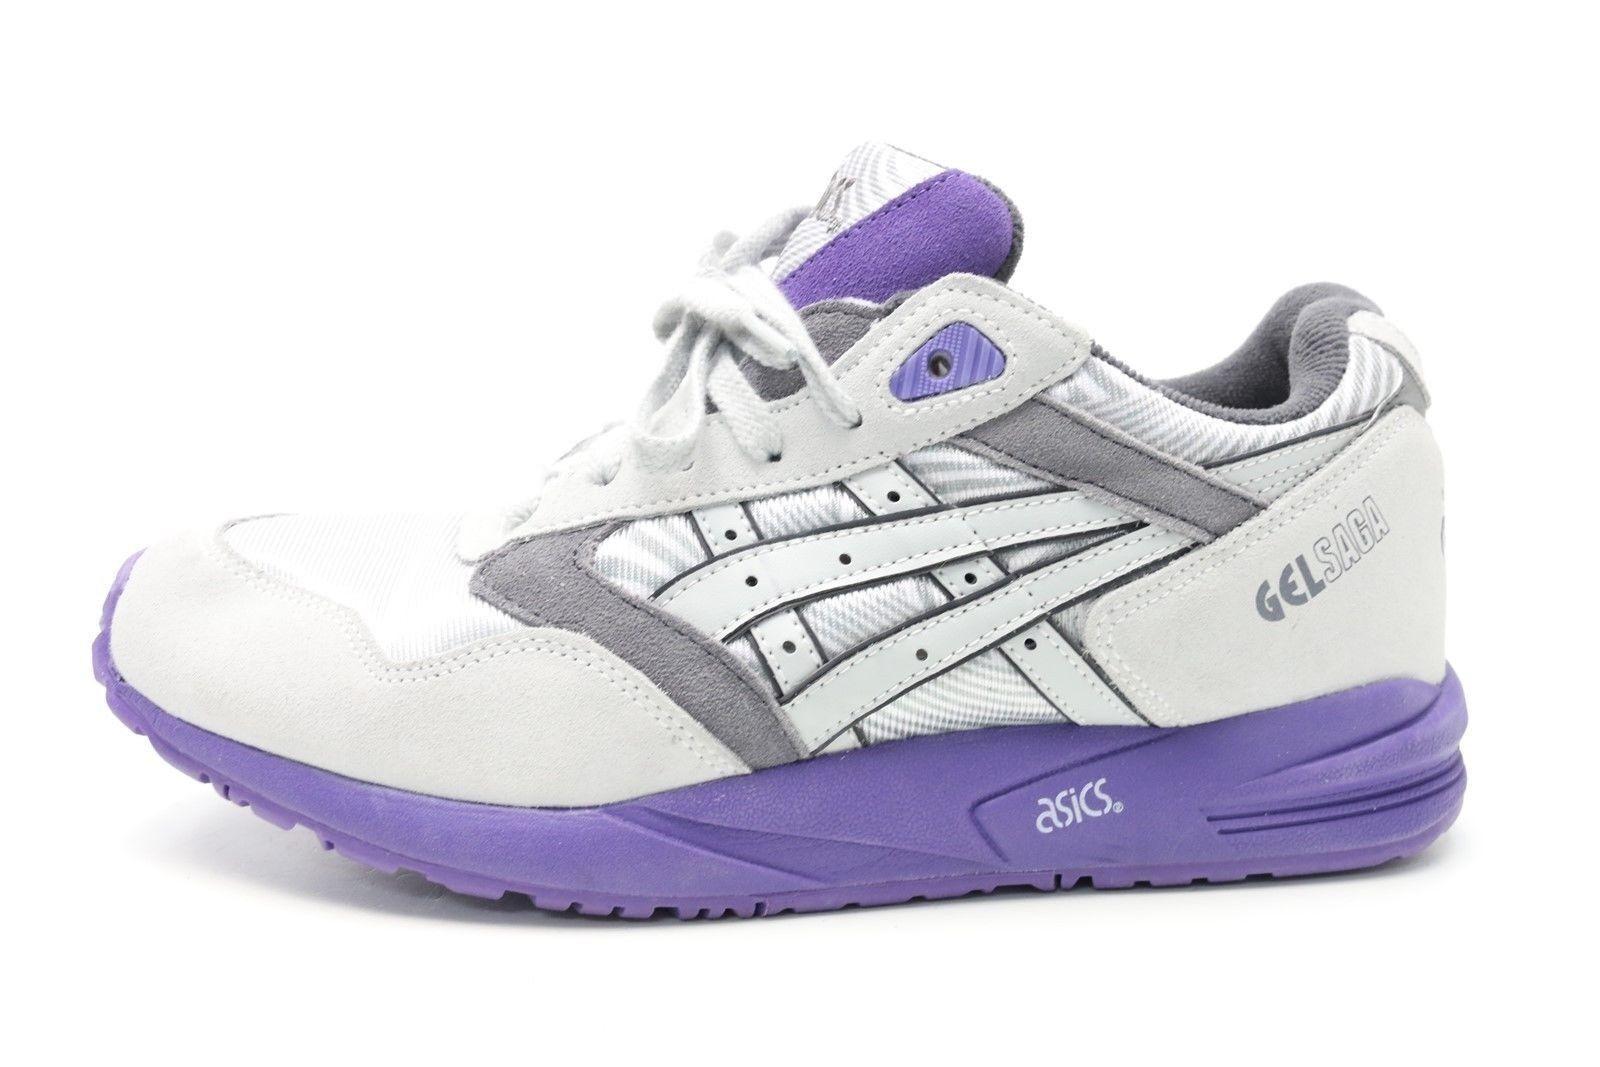 Damenschuhe ASICS gray / purple athletic sneakers sz. 9.5 NEU  150